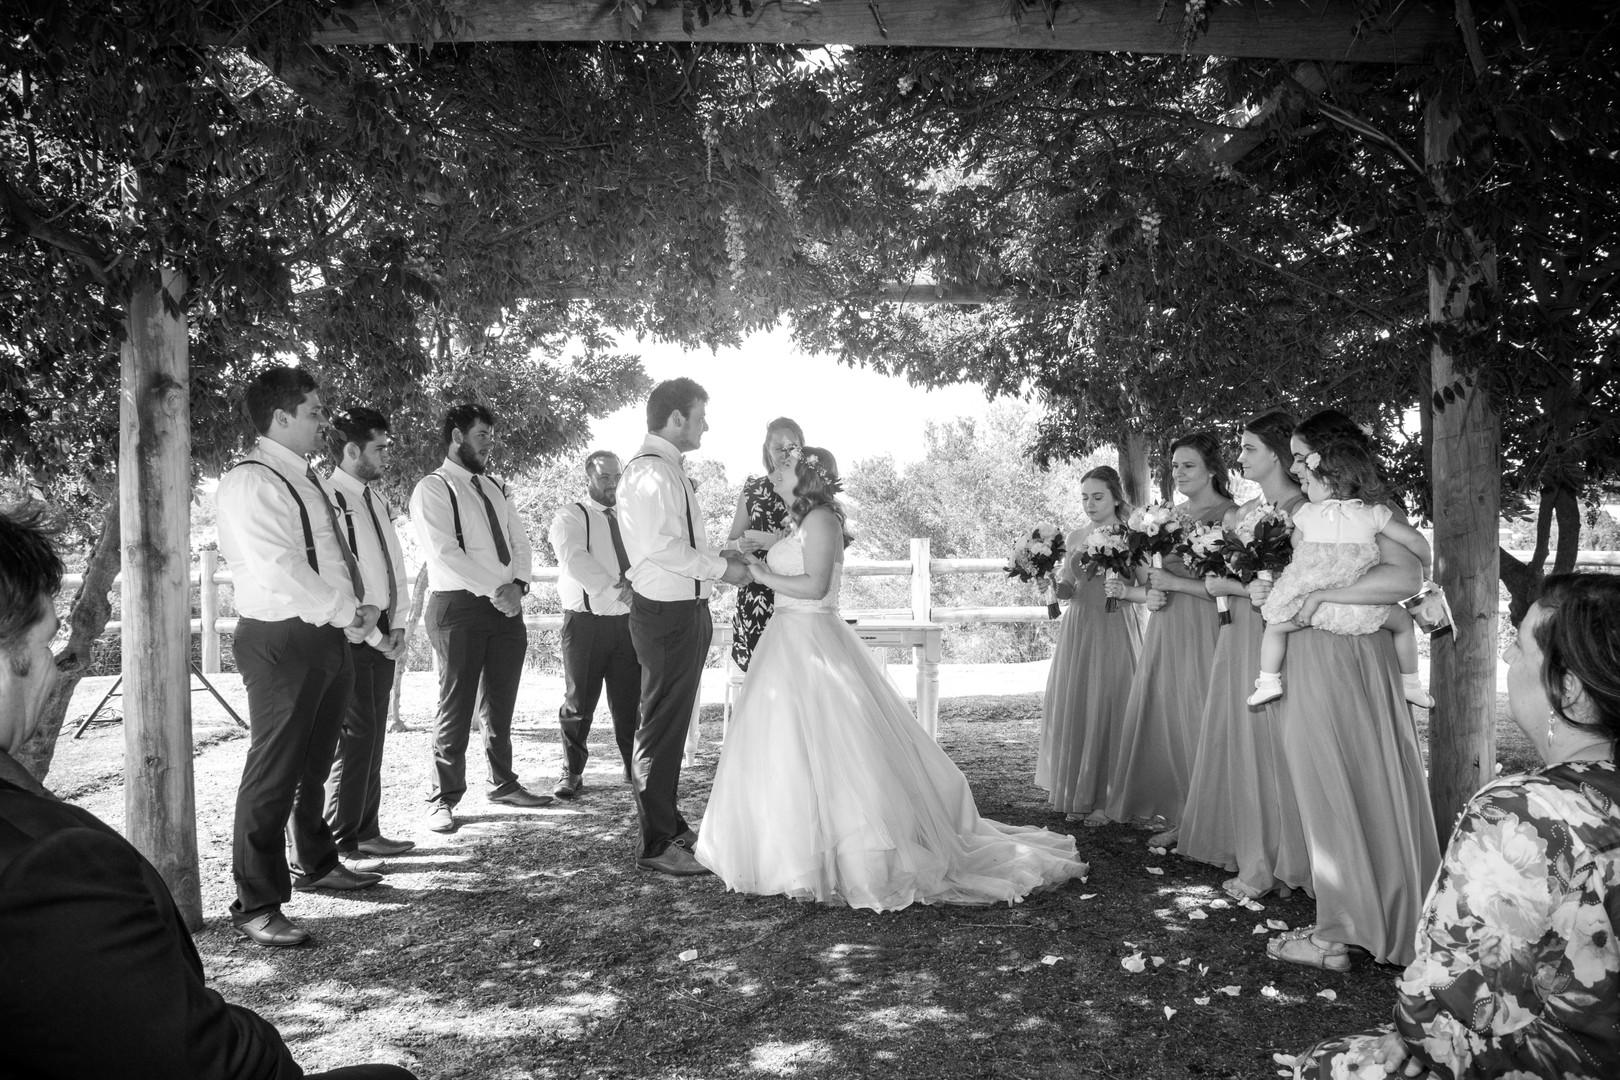 Wendy Hendry Marriage Celebrant